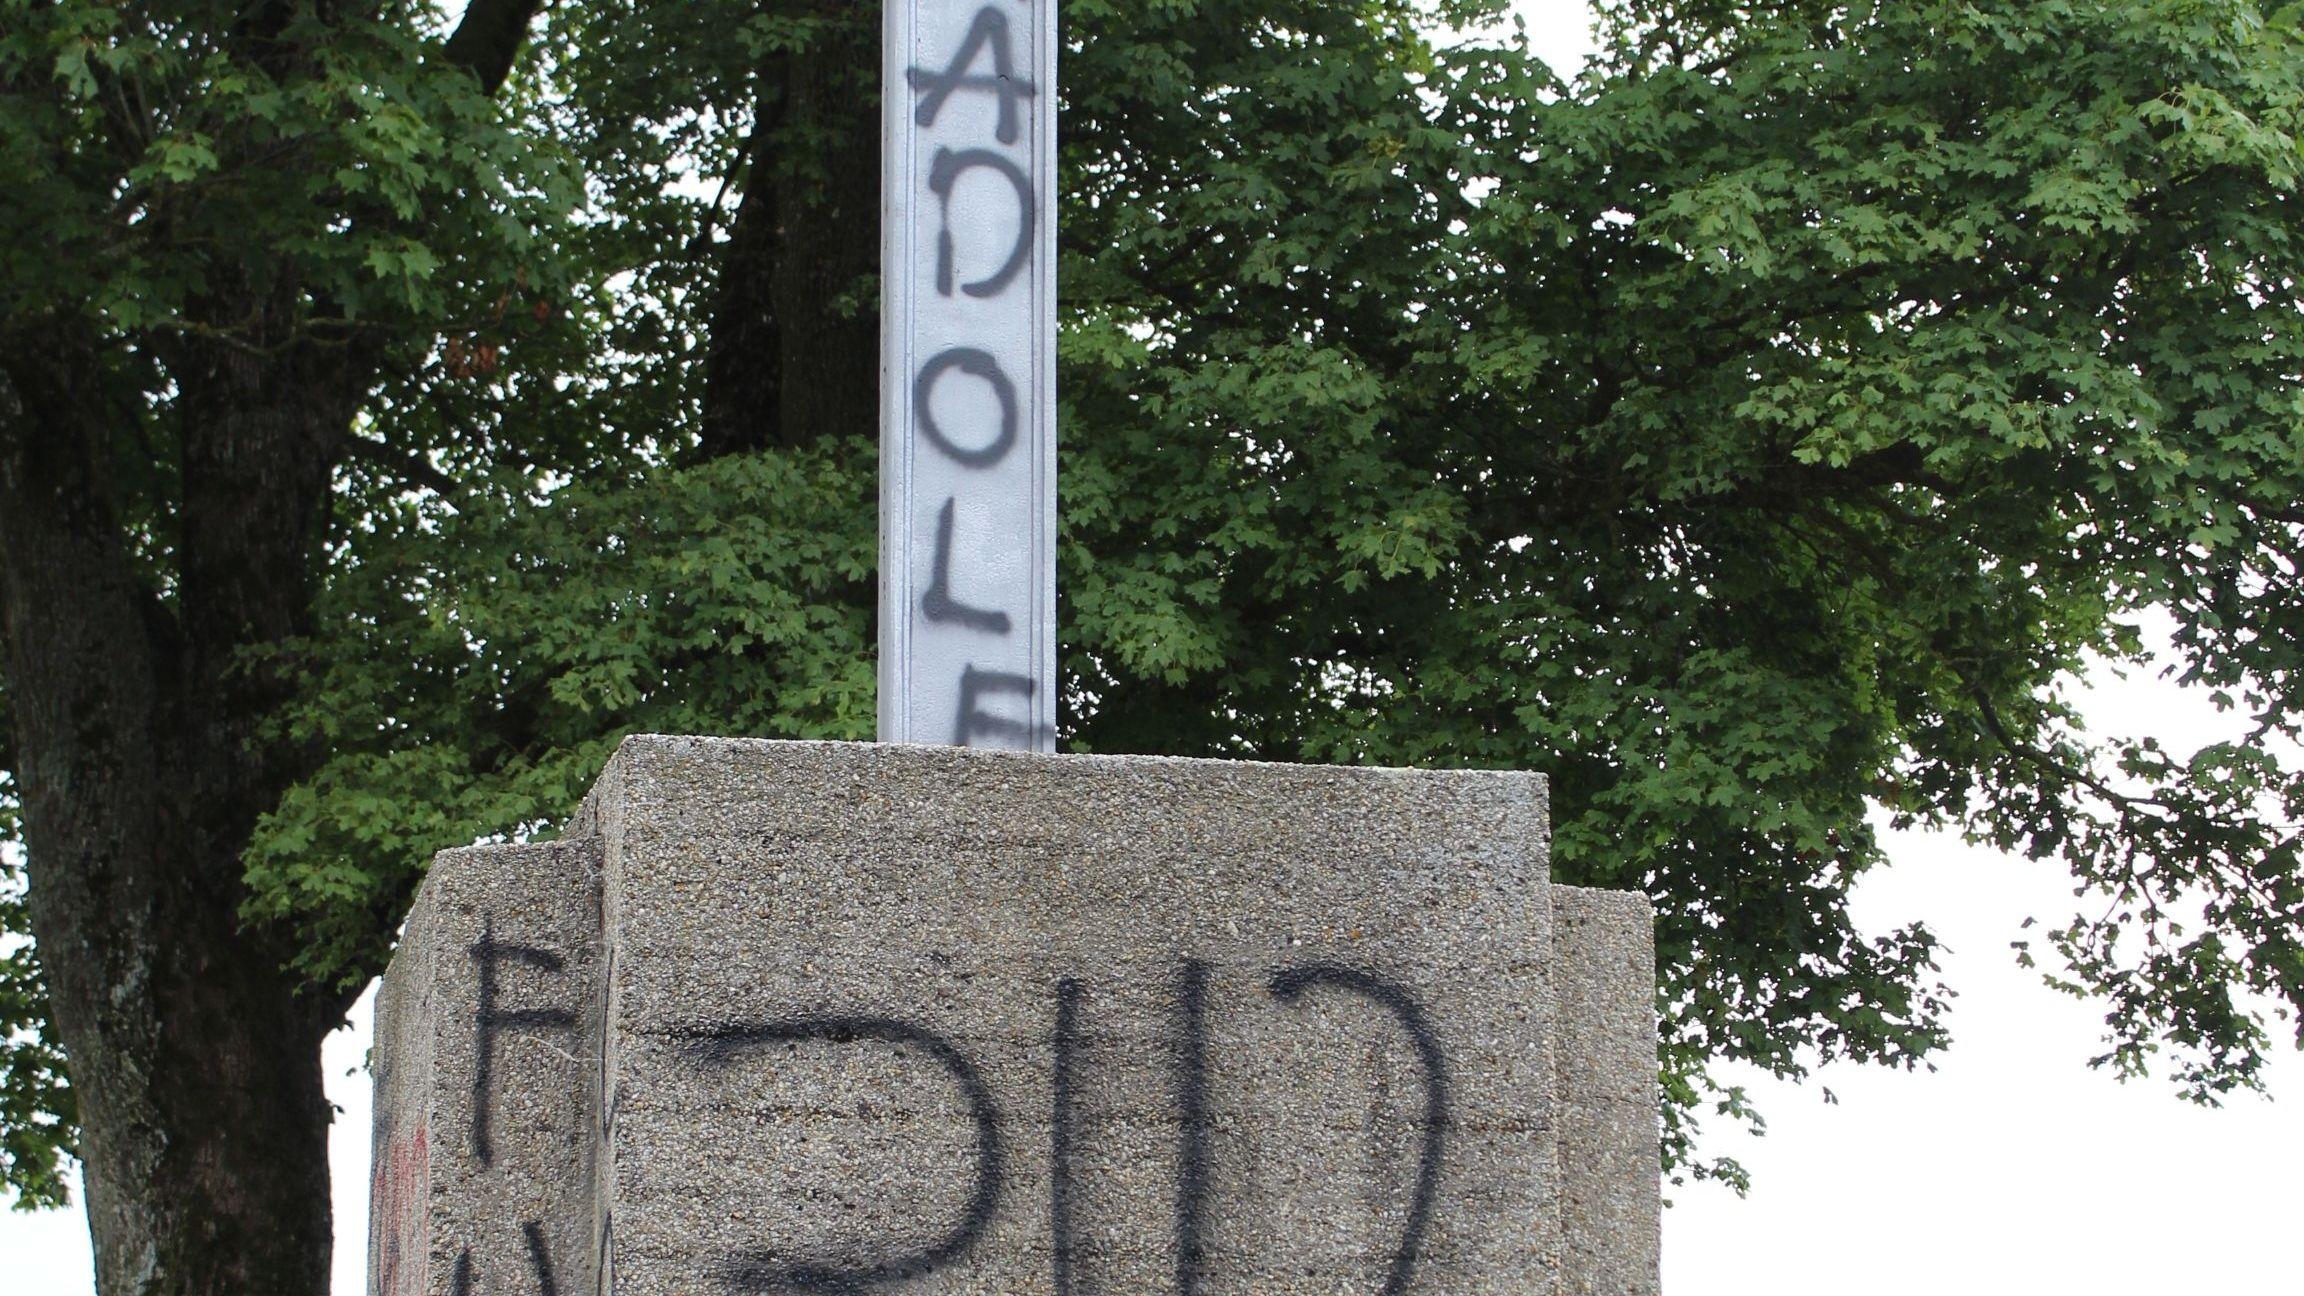 Rechtsradikale Parolen am Denkmal in Aidenbach